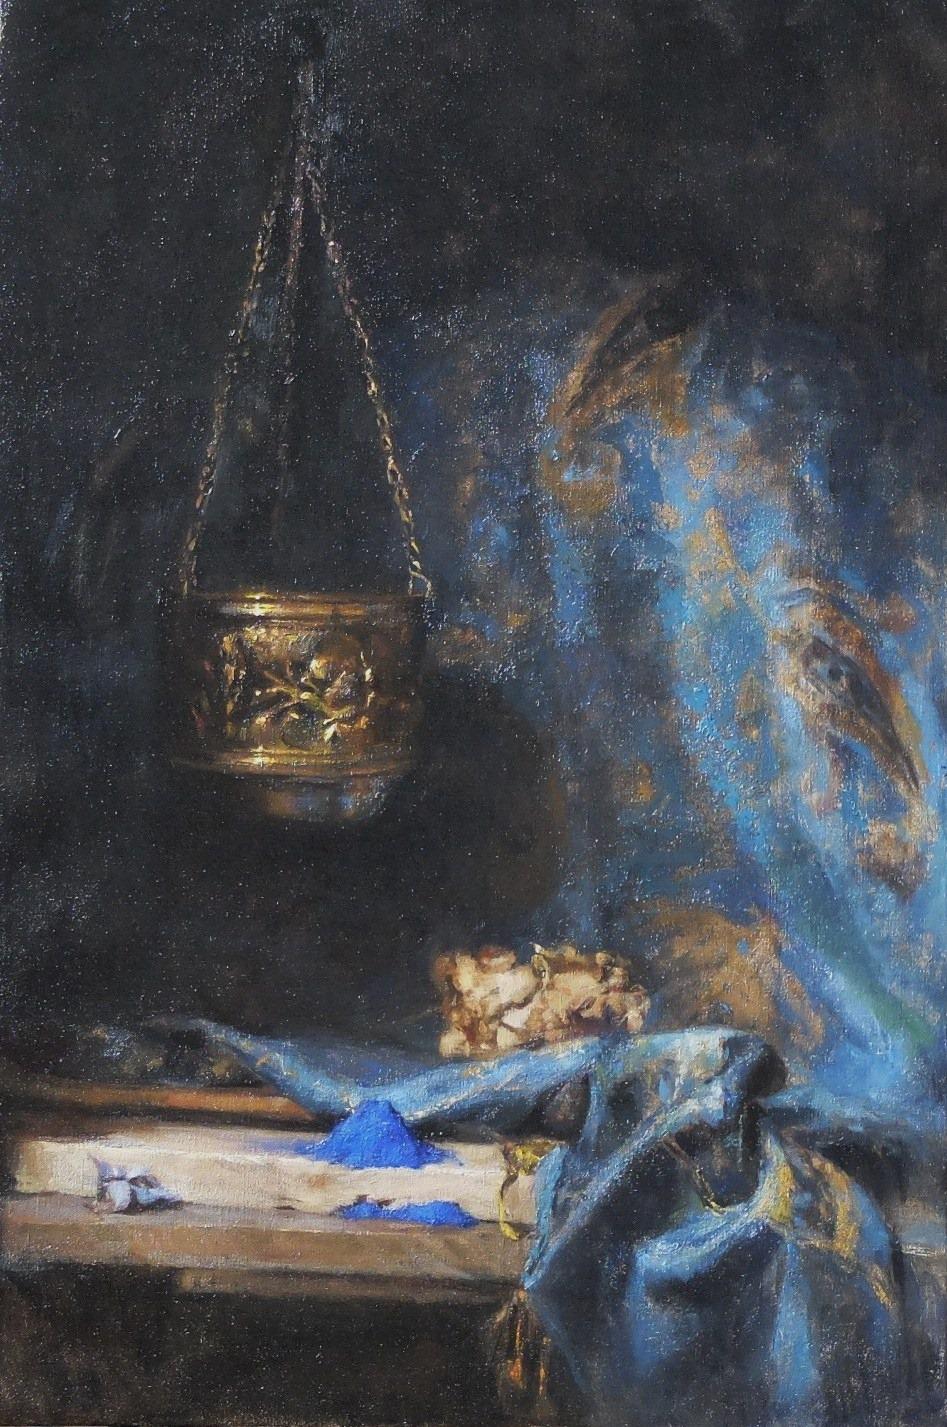 ' Symphony in Blue' 75 cm x 50 cm Oil on linen